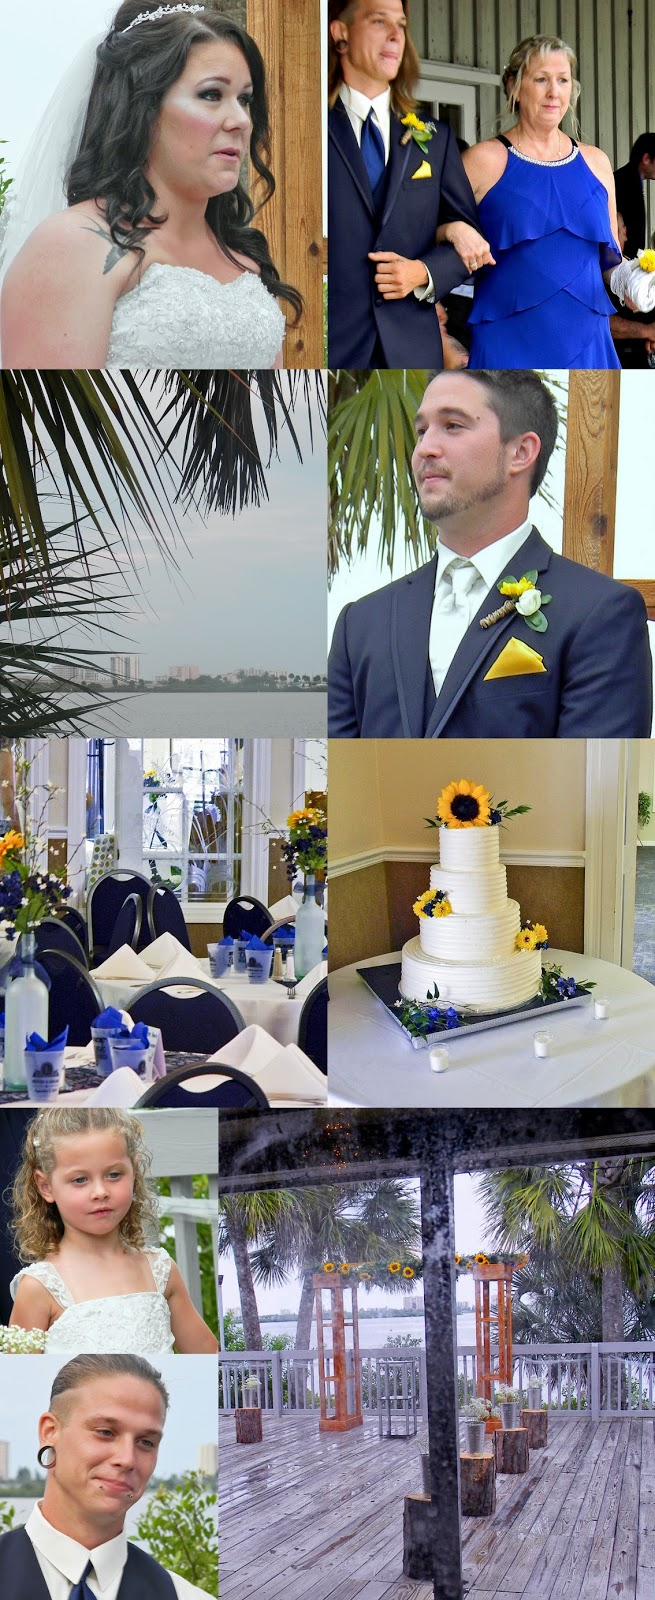 Longfritz Wedding Photo Collage